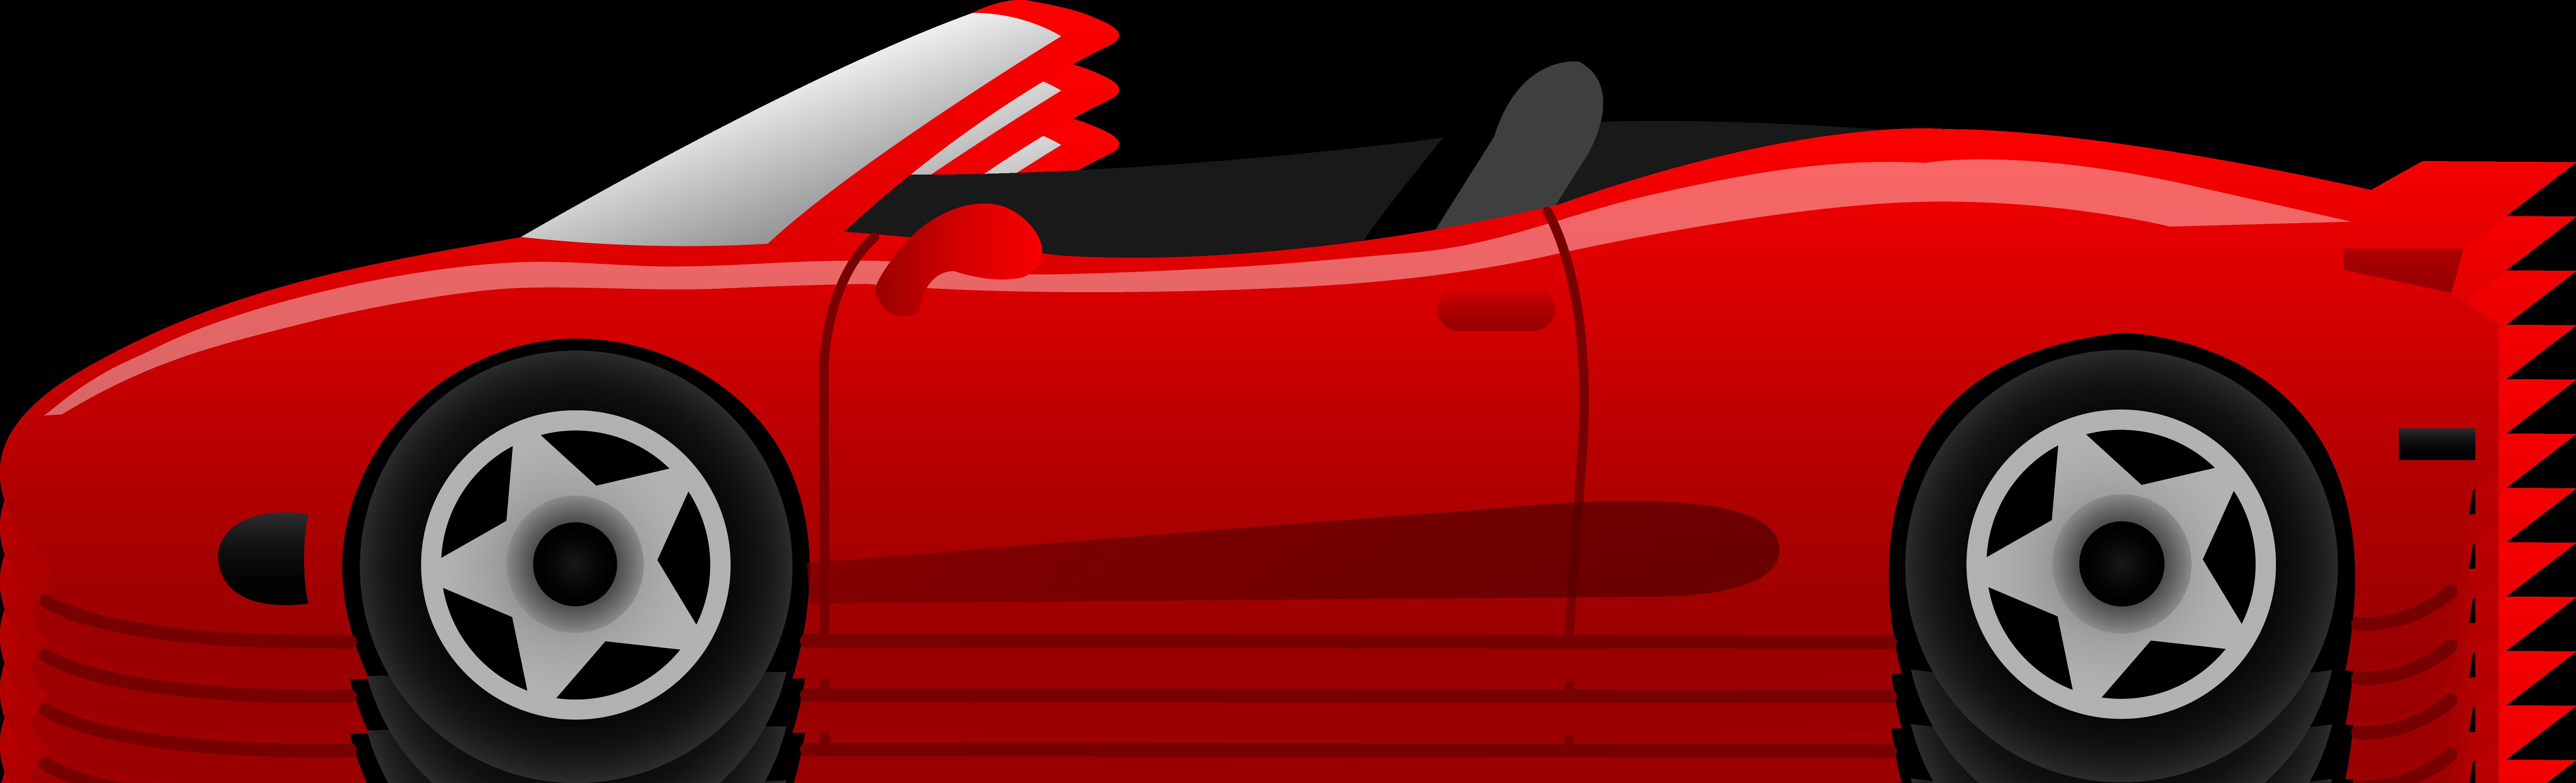 Cartoon Cars Clip Art